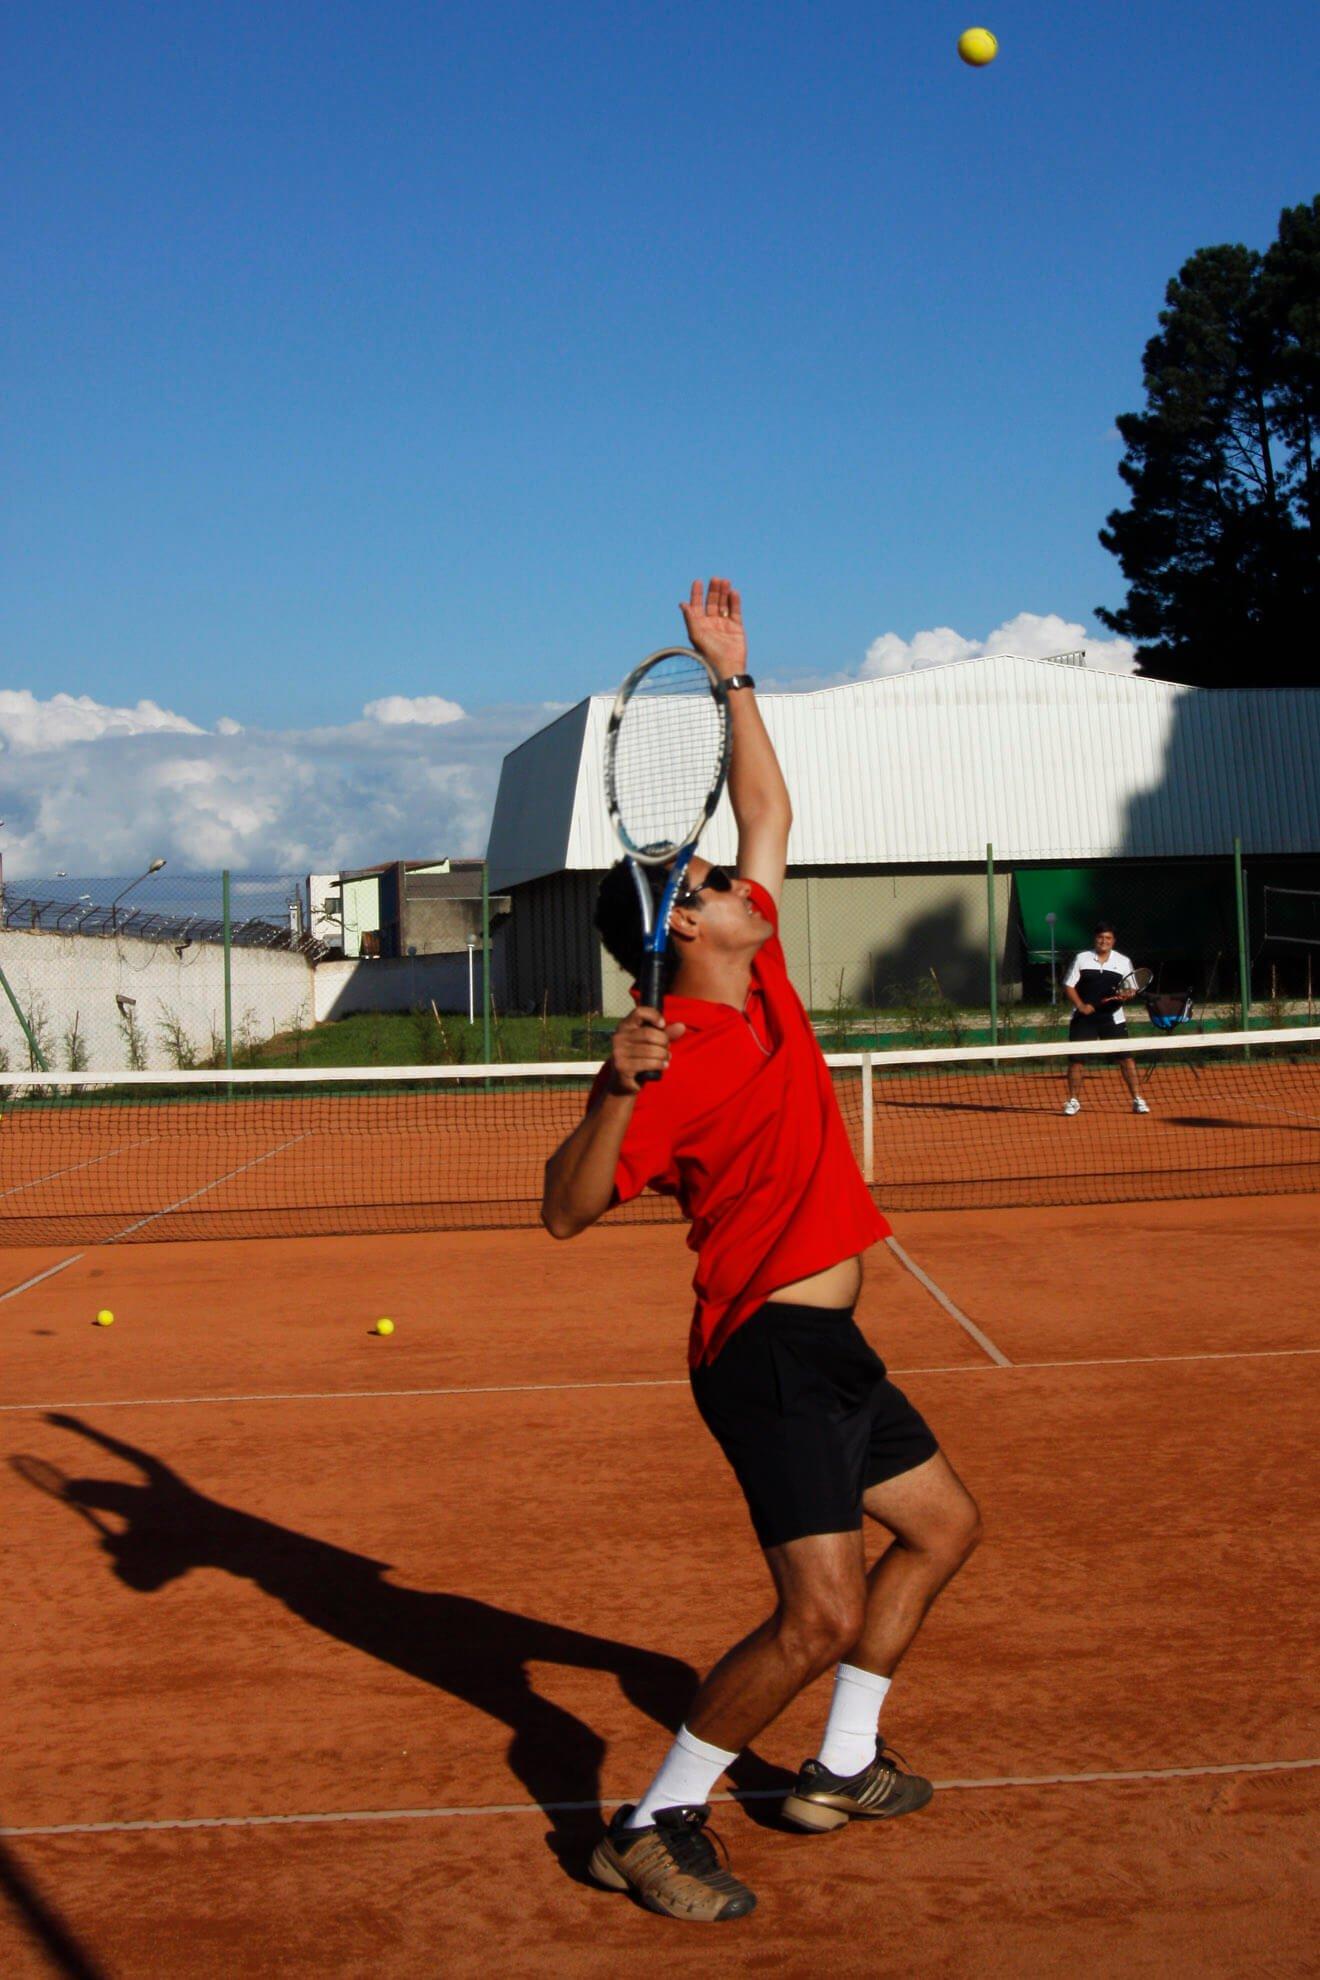 Campo de Tennis - Aula de Tennis - No Spa Medico - Spa Sorocaba